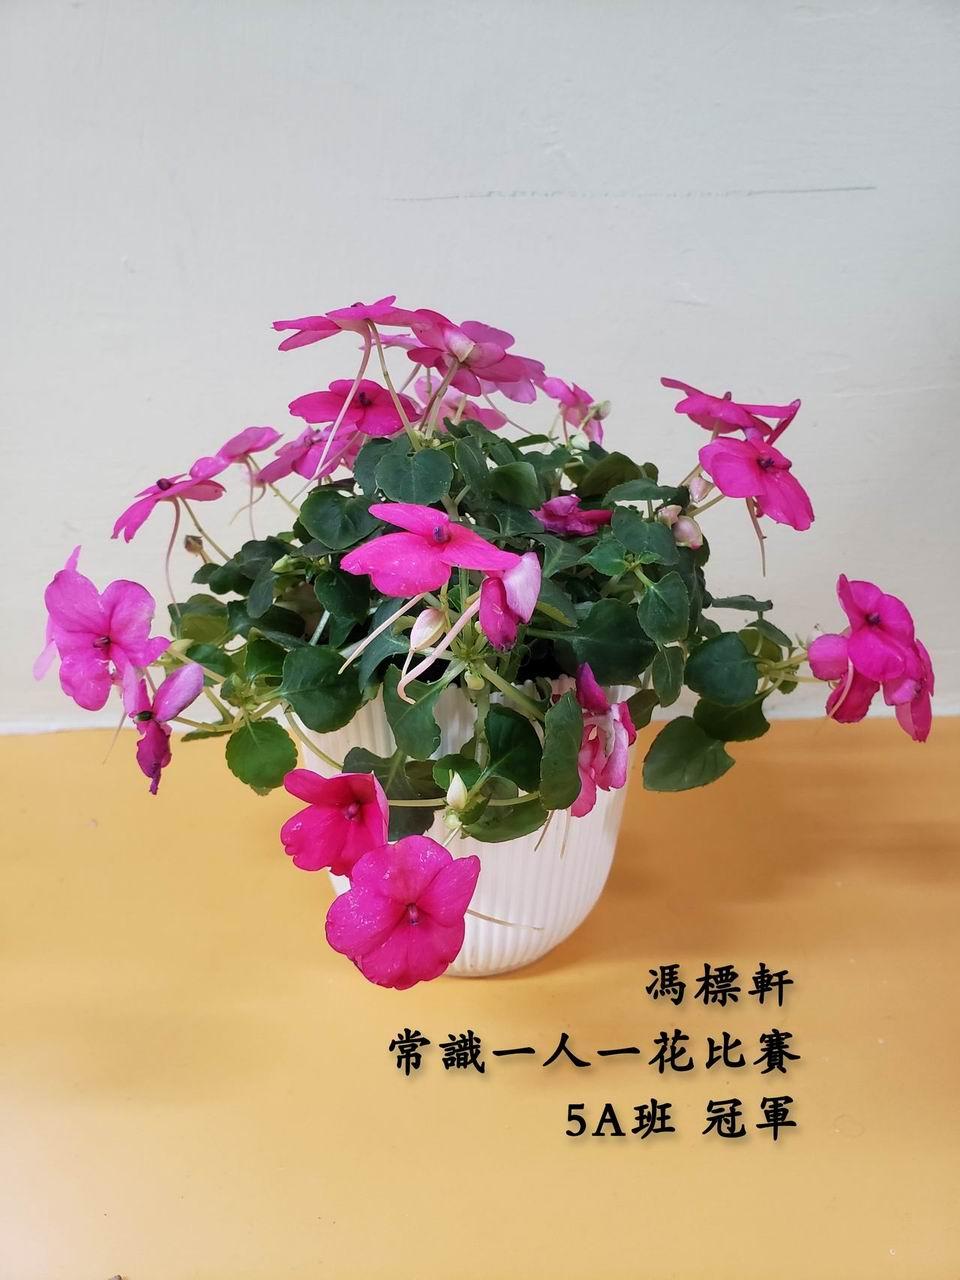 https://plkcjy.edu.hk/sites/default/files/diao_zheng_da_xiao_5a_guan_.jpg